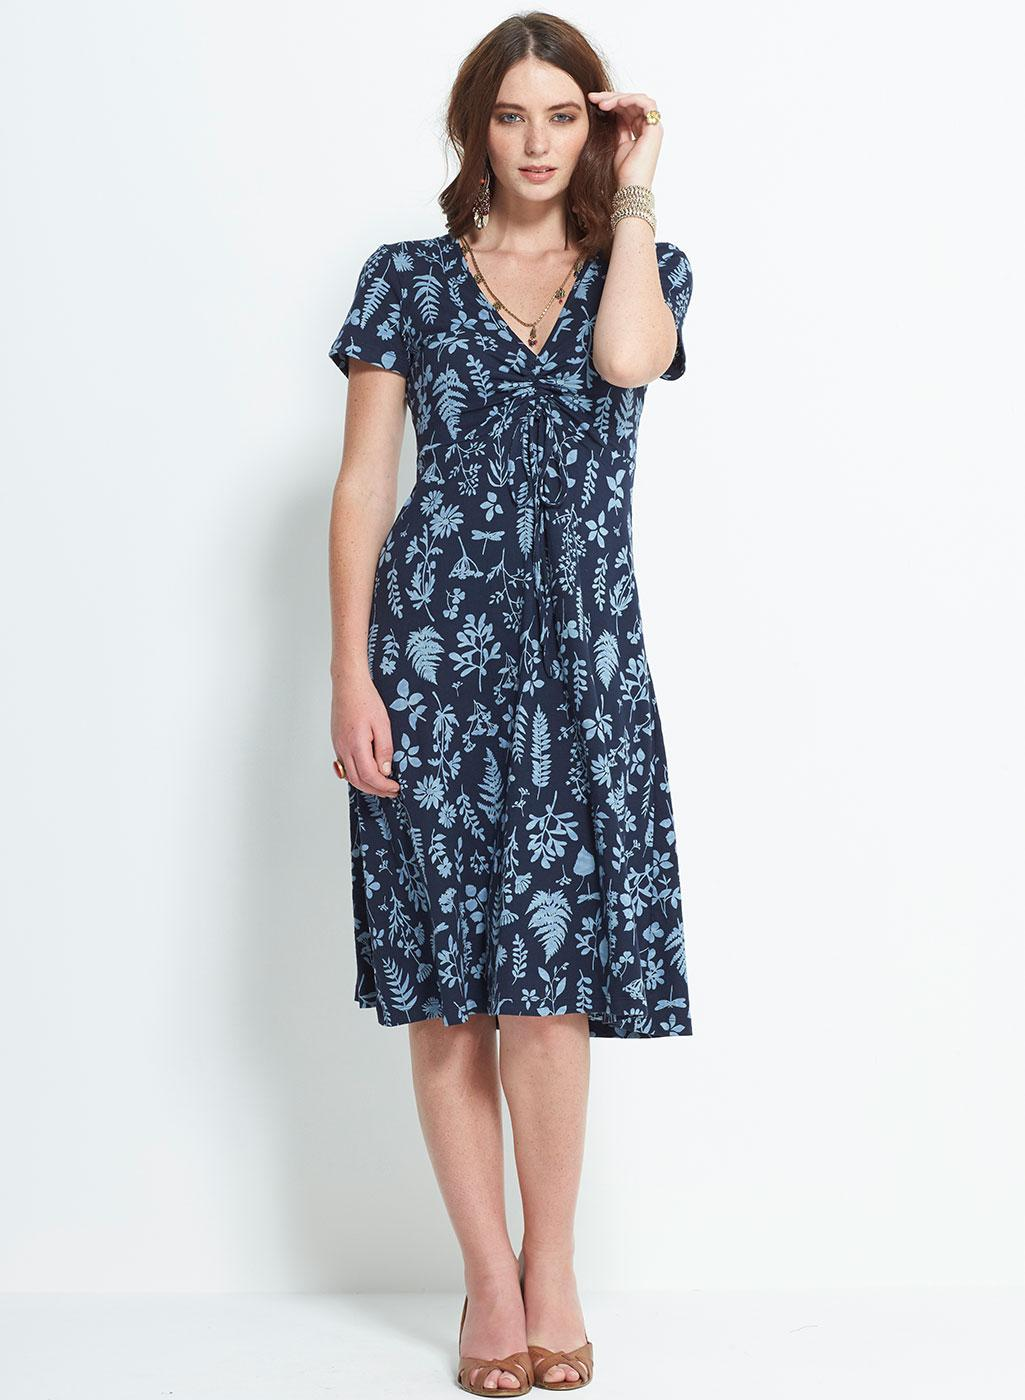 NOMADS Retro Floral Botanical Organic Cotton Dress